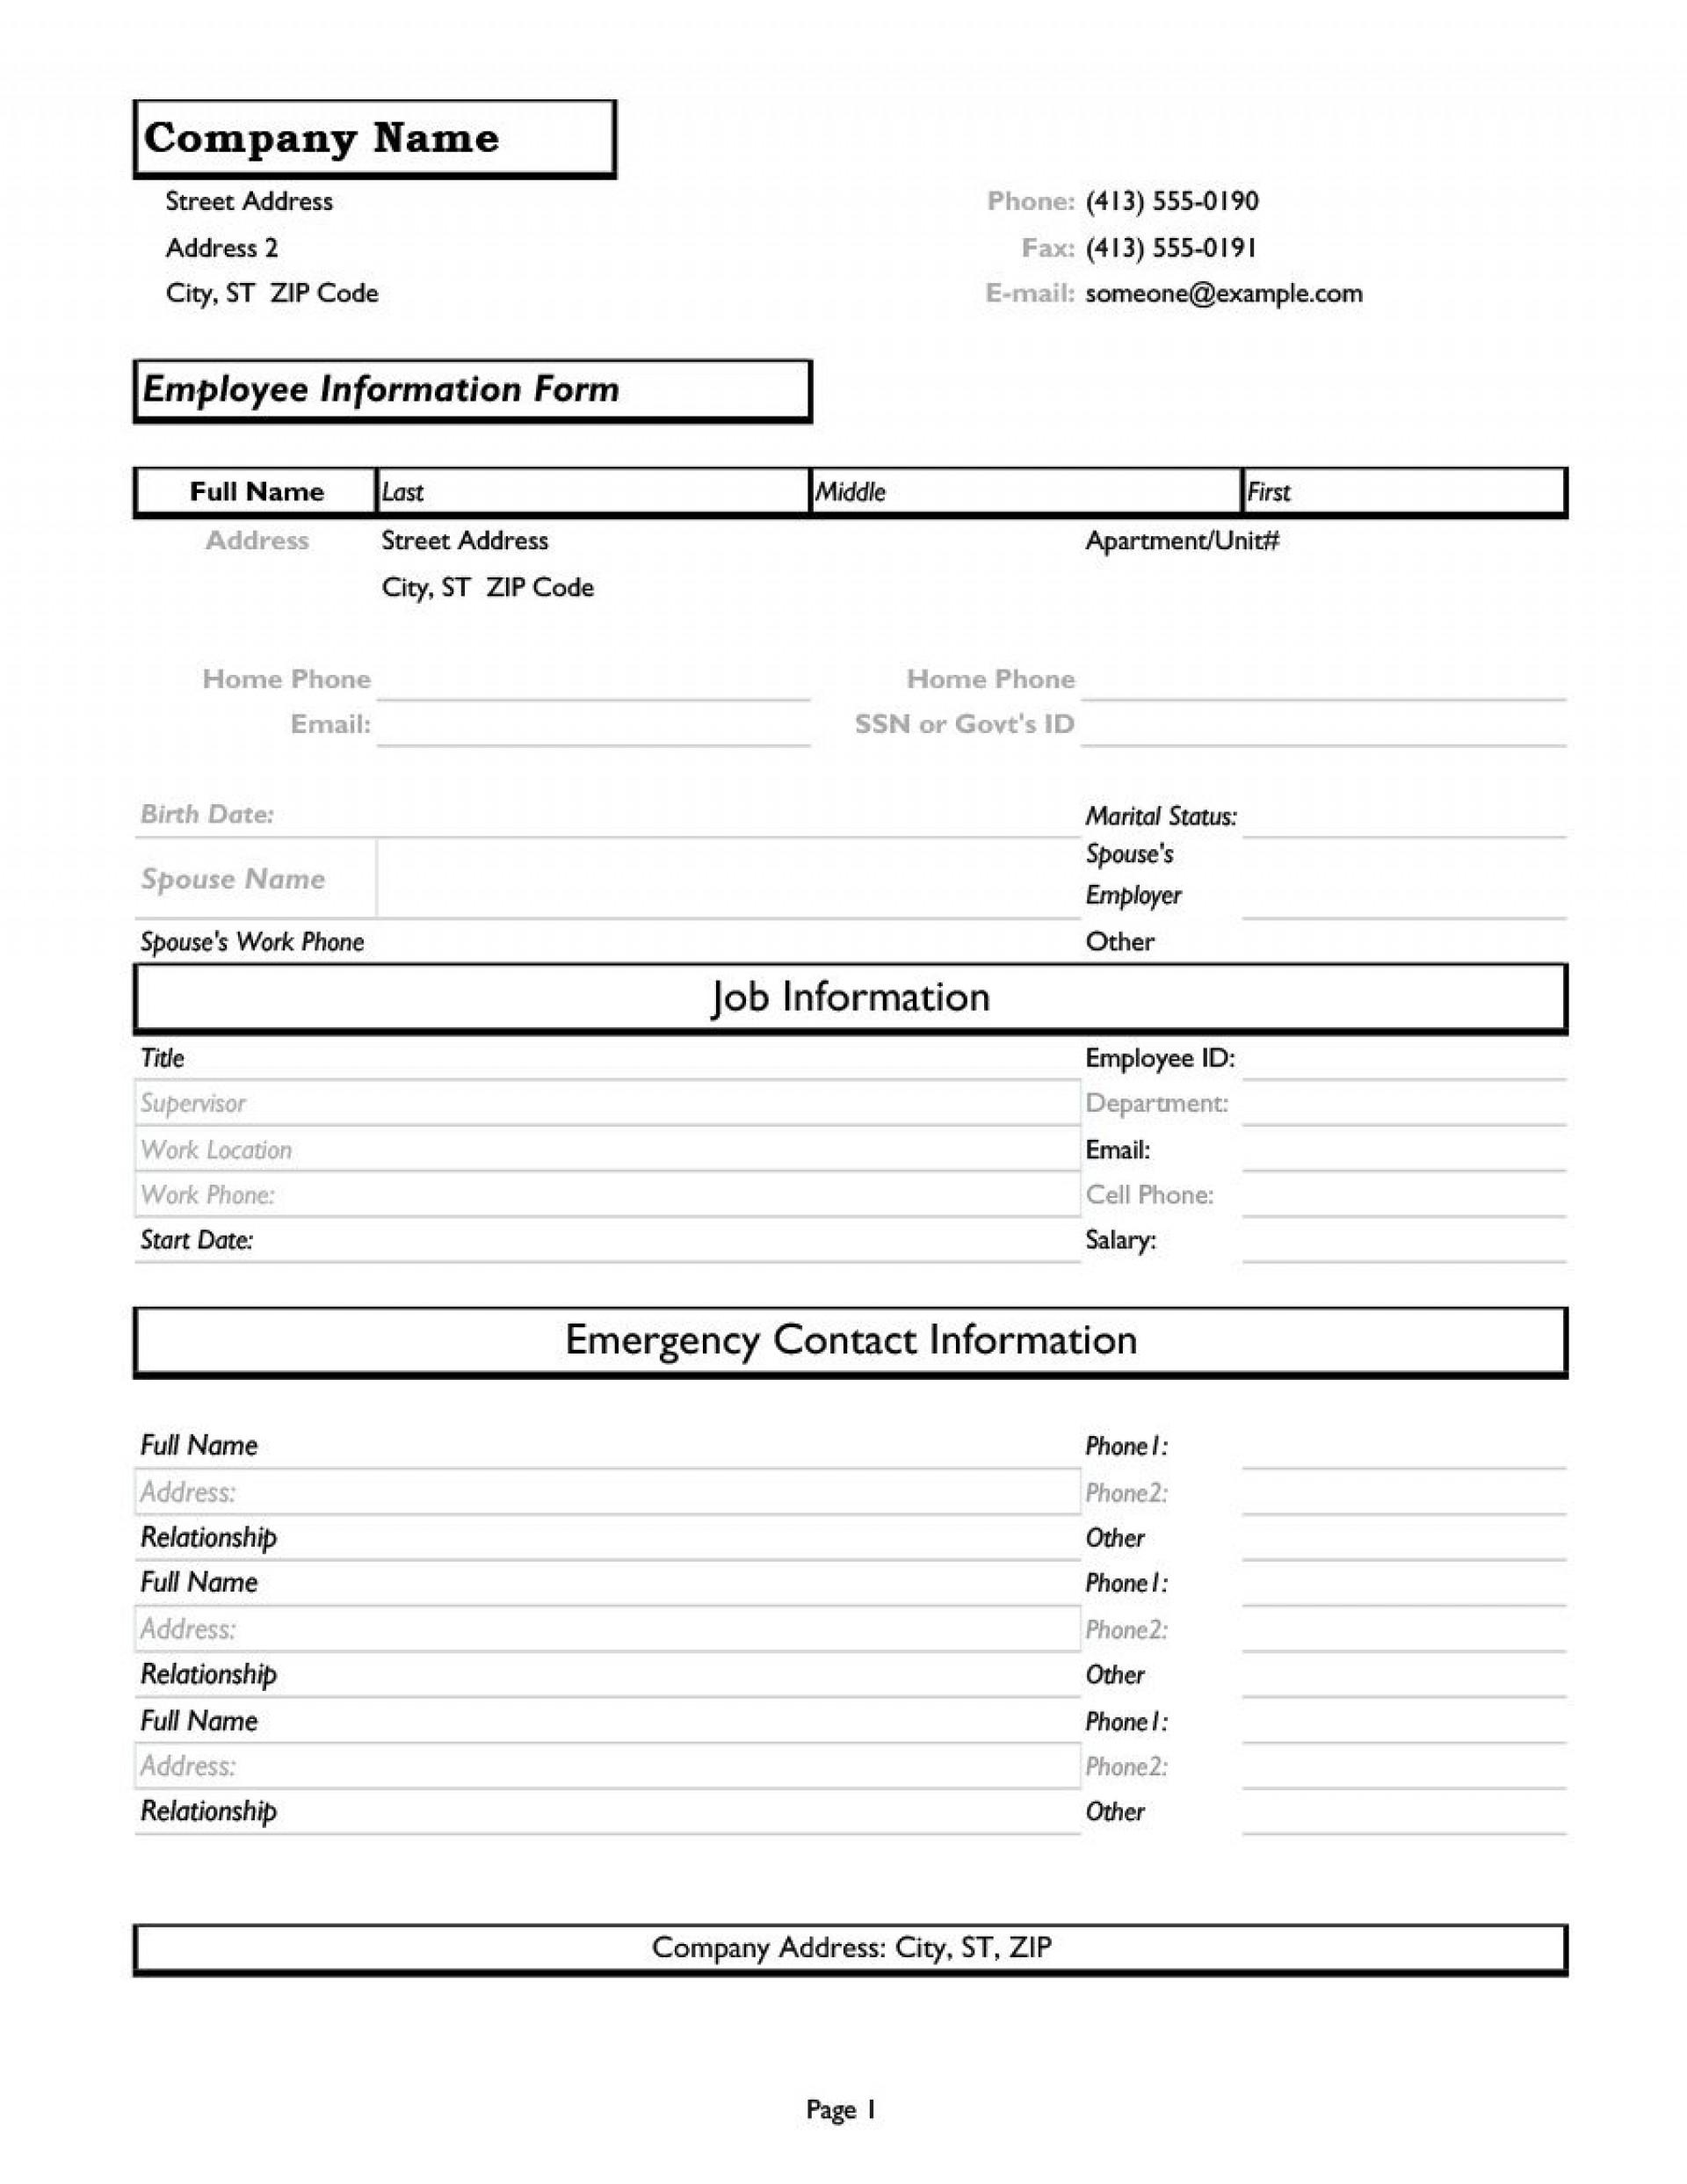 012 Unique Employee Personnel File Template Image  Checklist Request Form Release1920